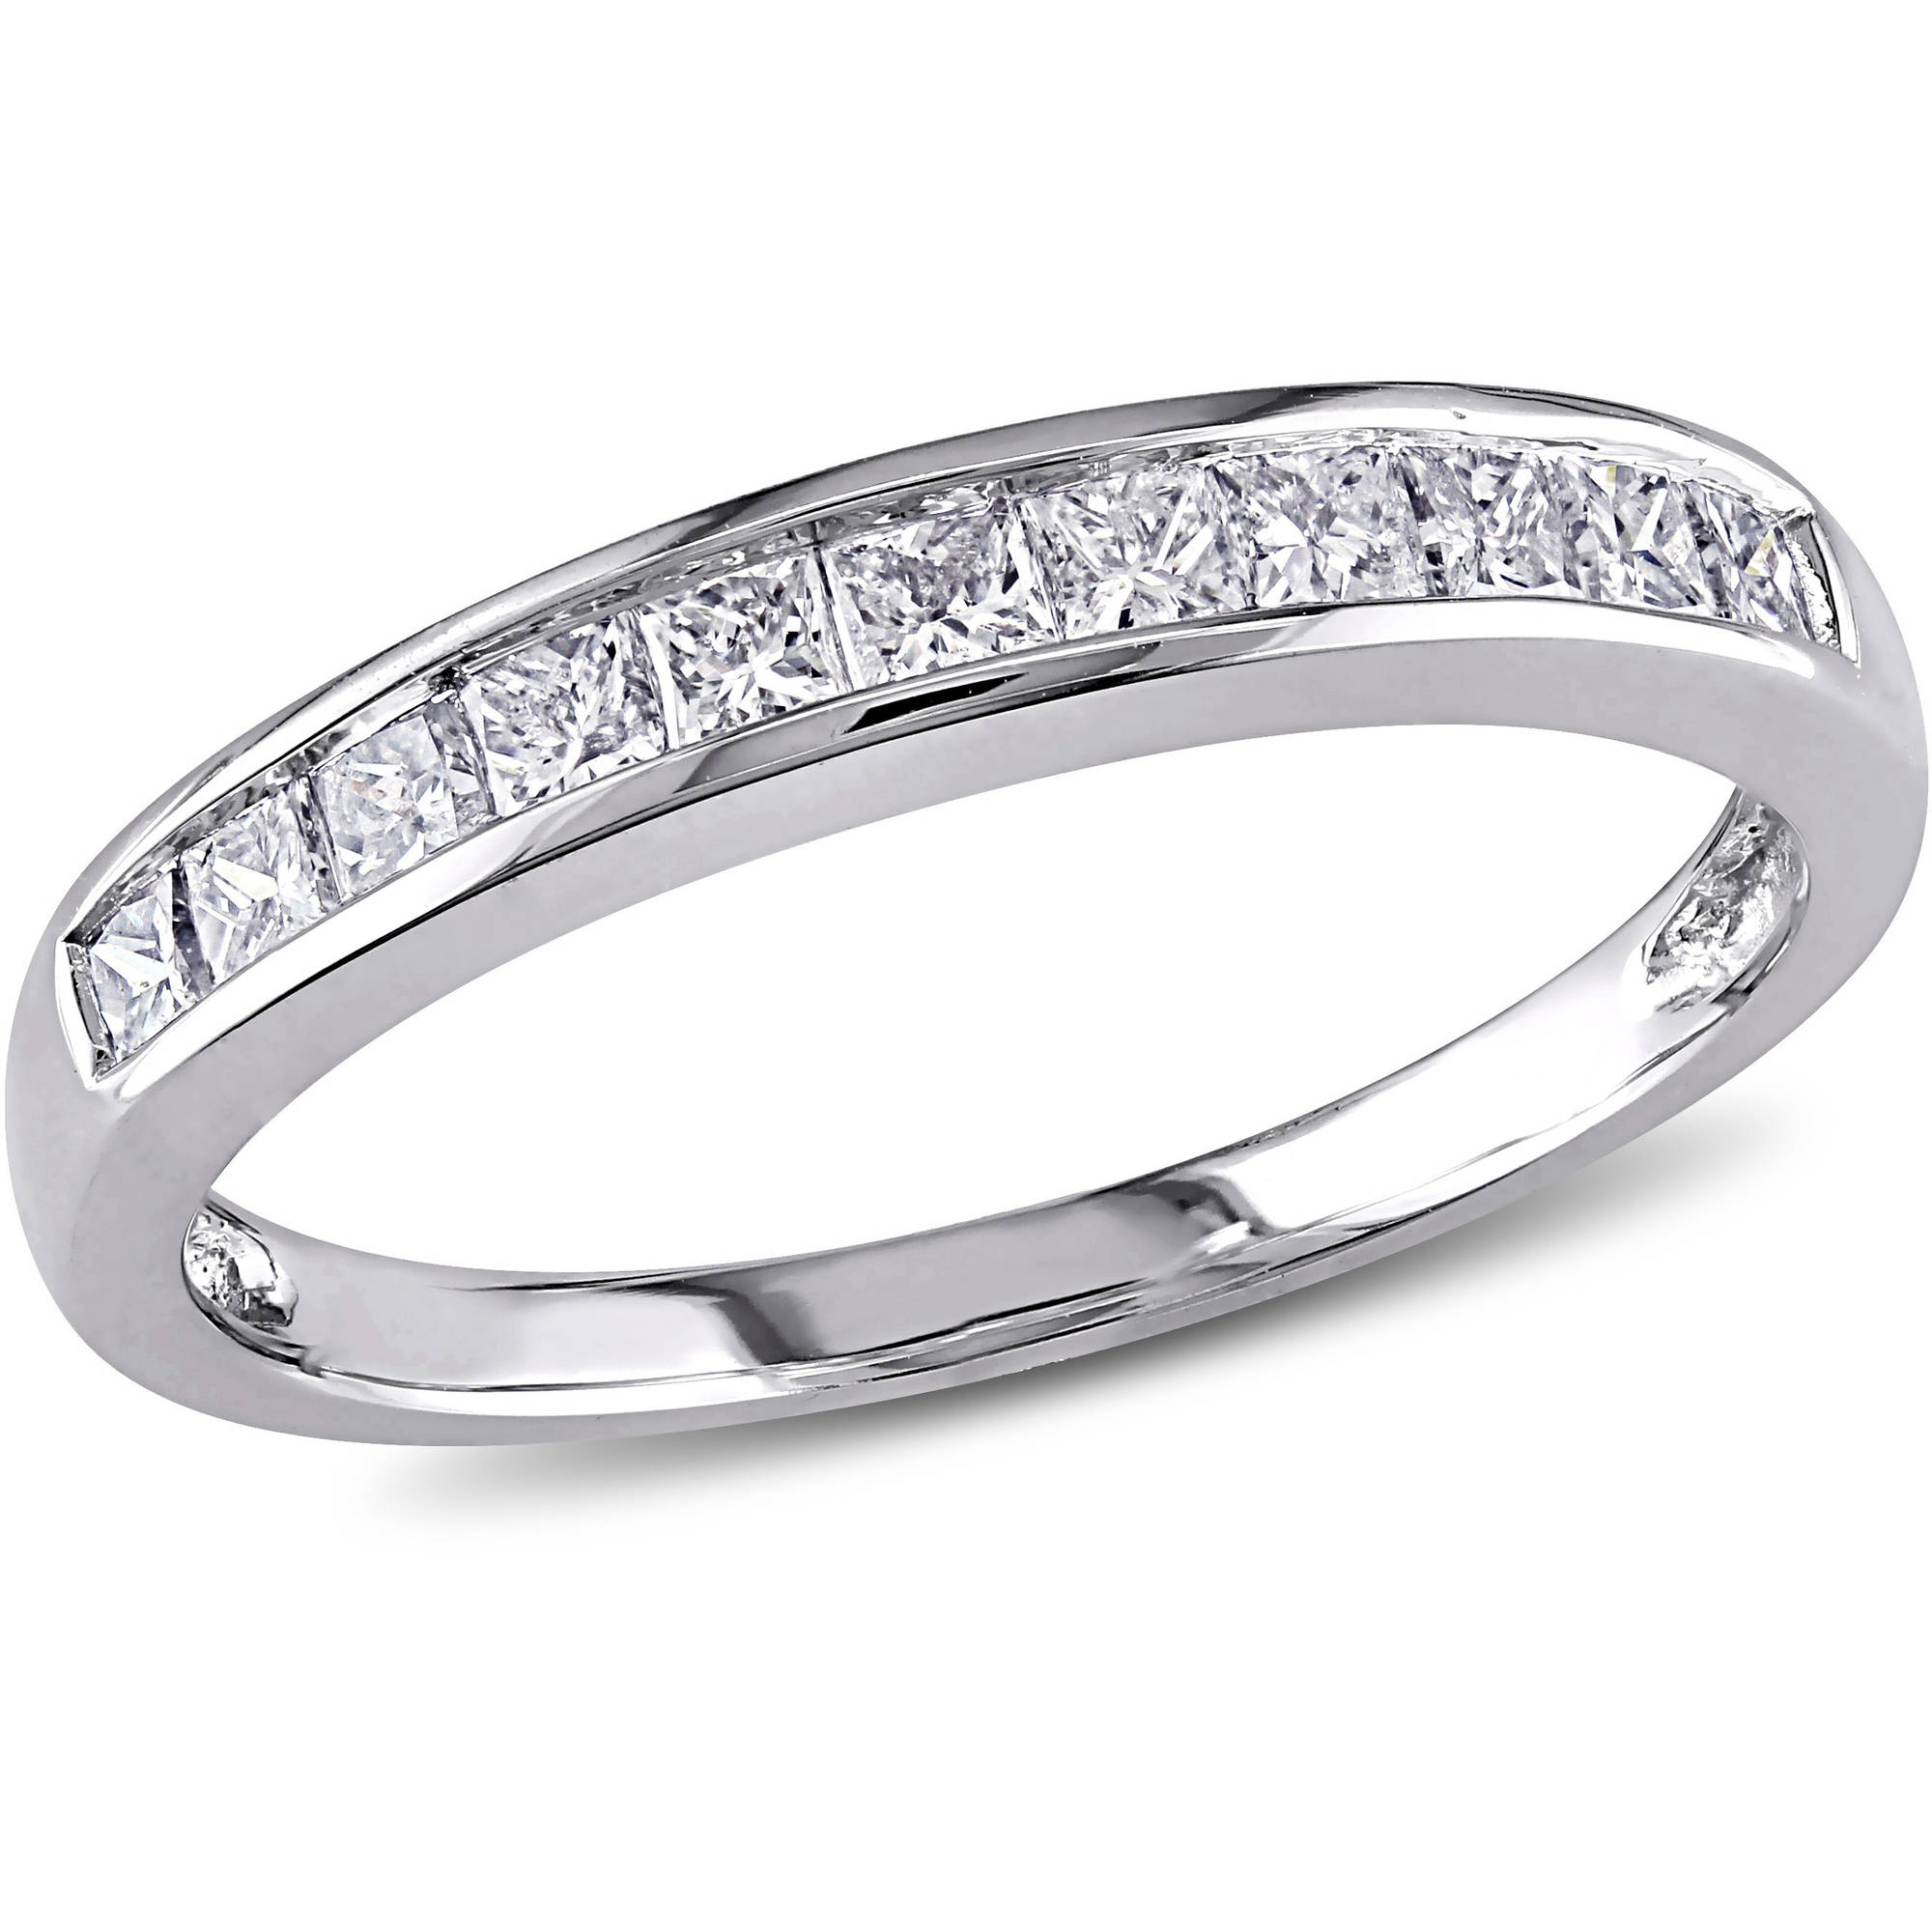 Miabella 1/2 Carat T.W. Princess-Cut Diamond 14kt White Gold Semi-Eternity Anniversary Ring